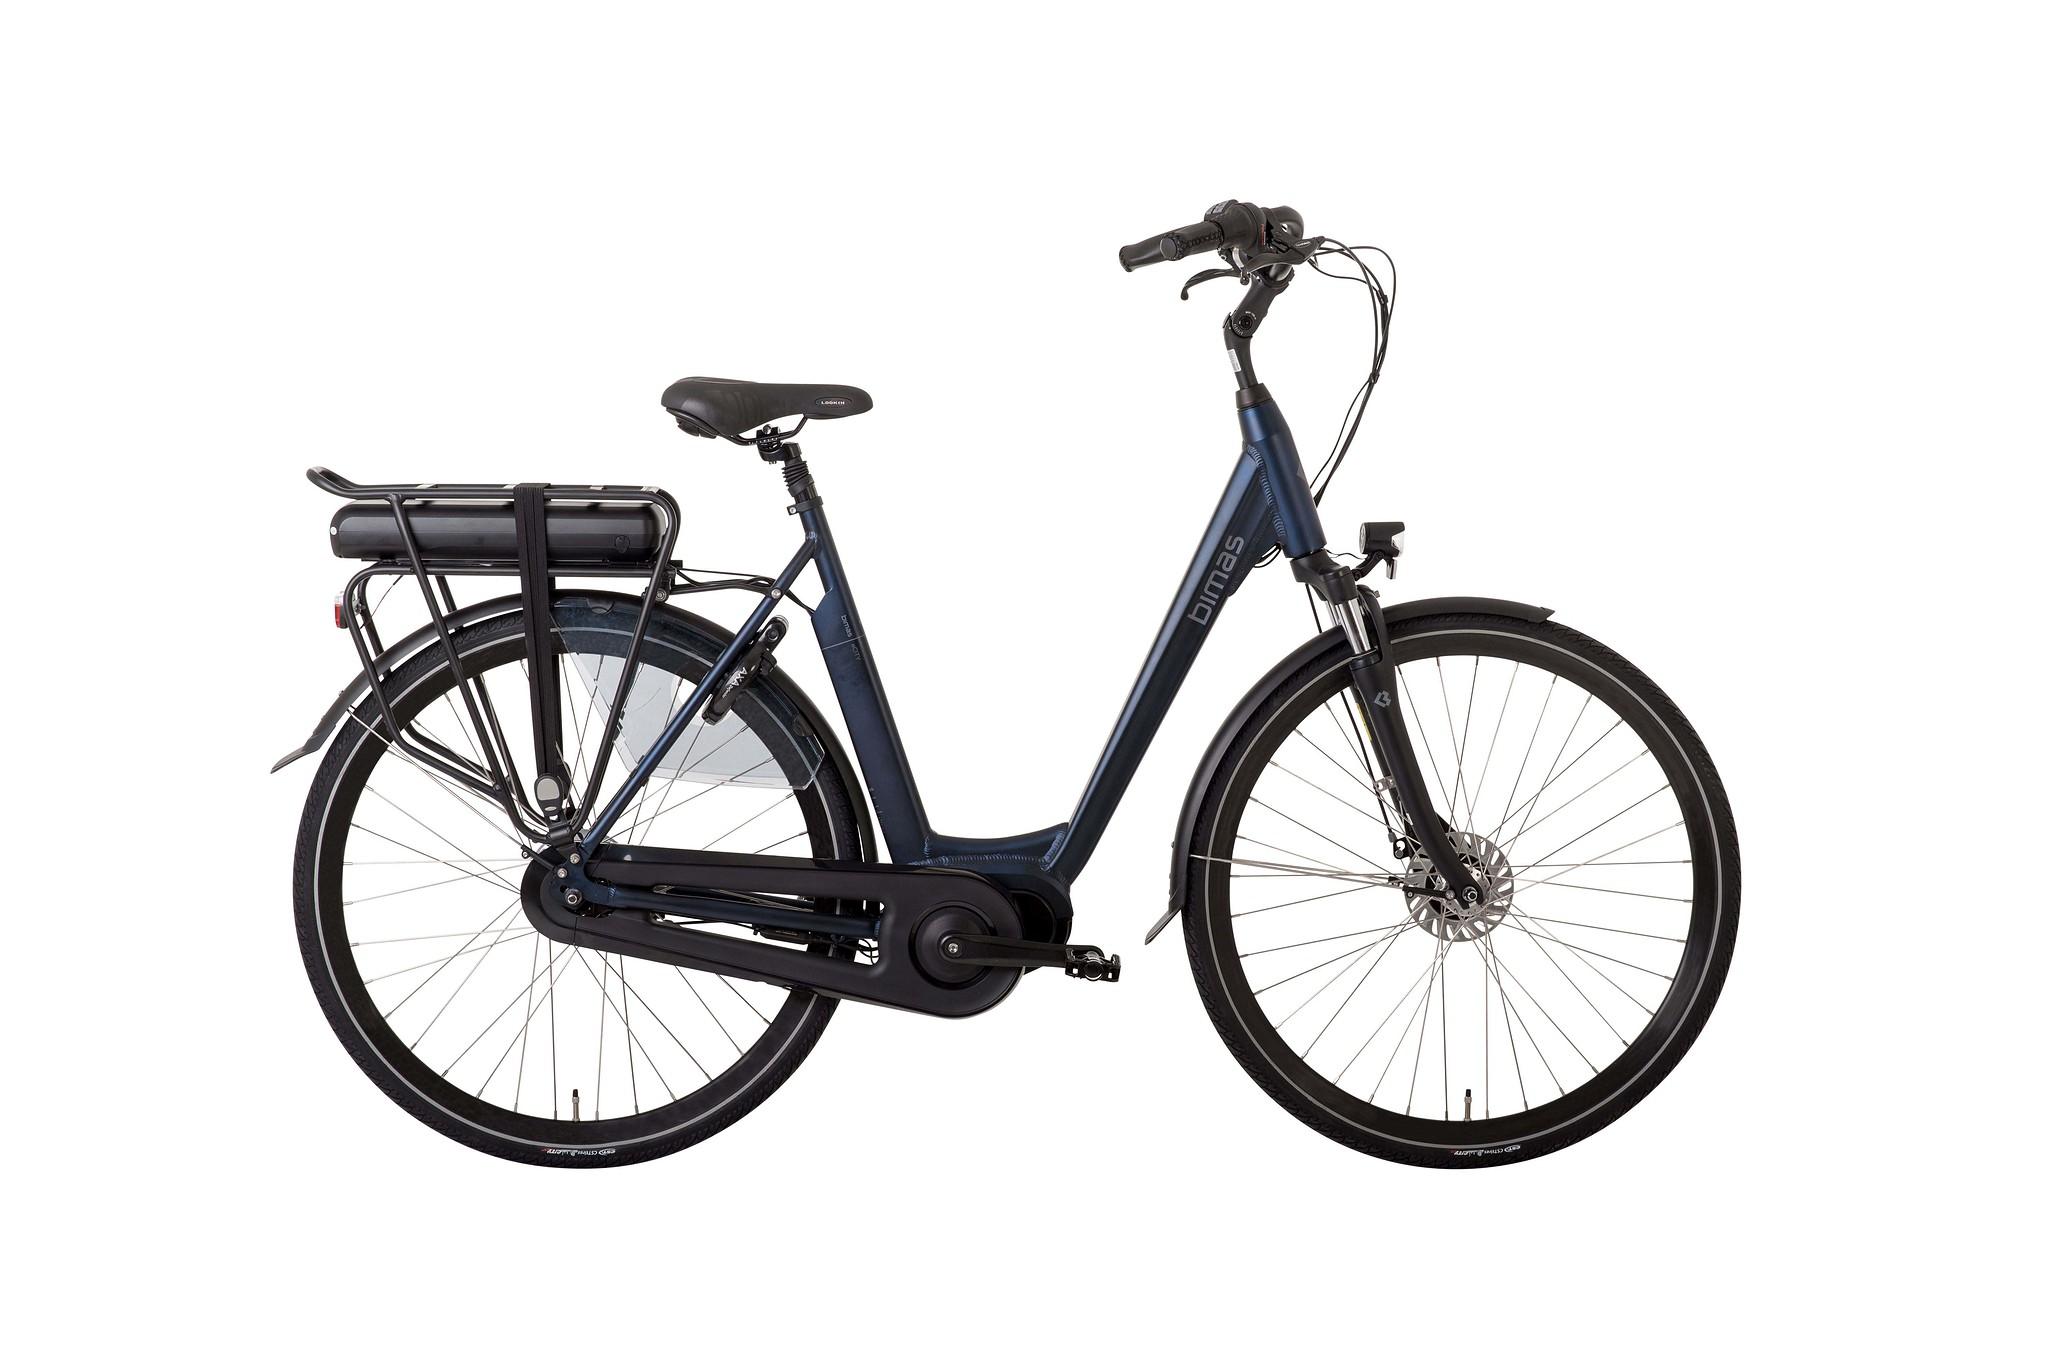 Bimas Elektrische fiets E-City 7.3 dames navy blauw 57cm 450 Watt Blauw